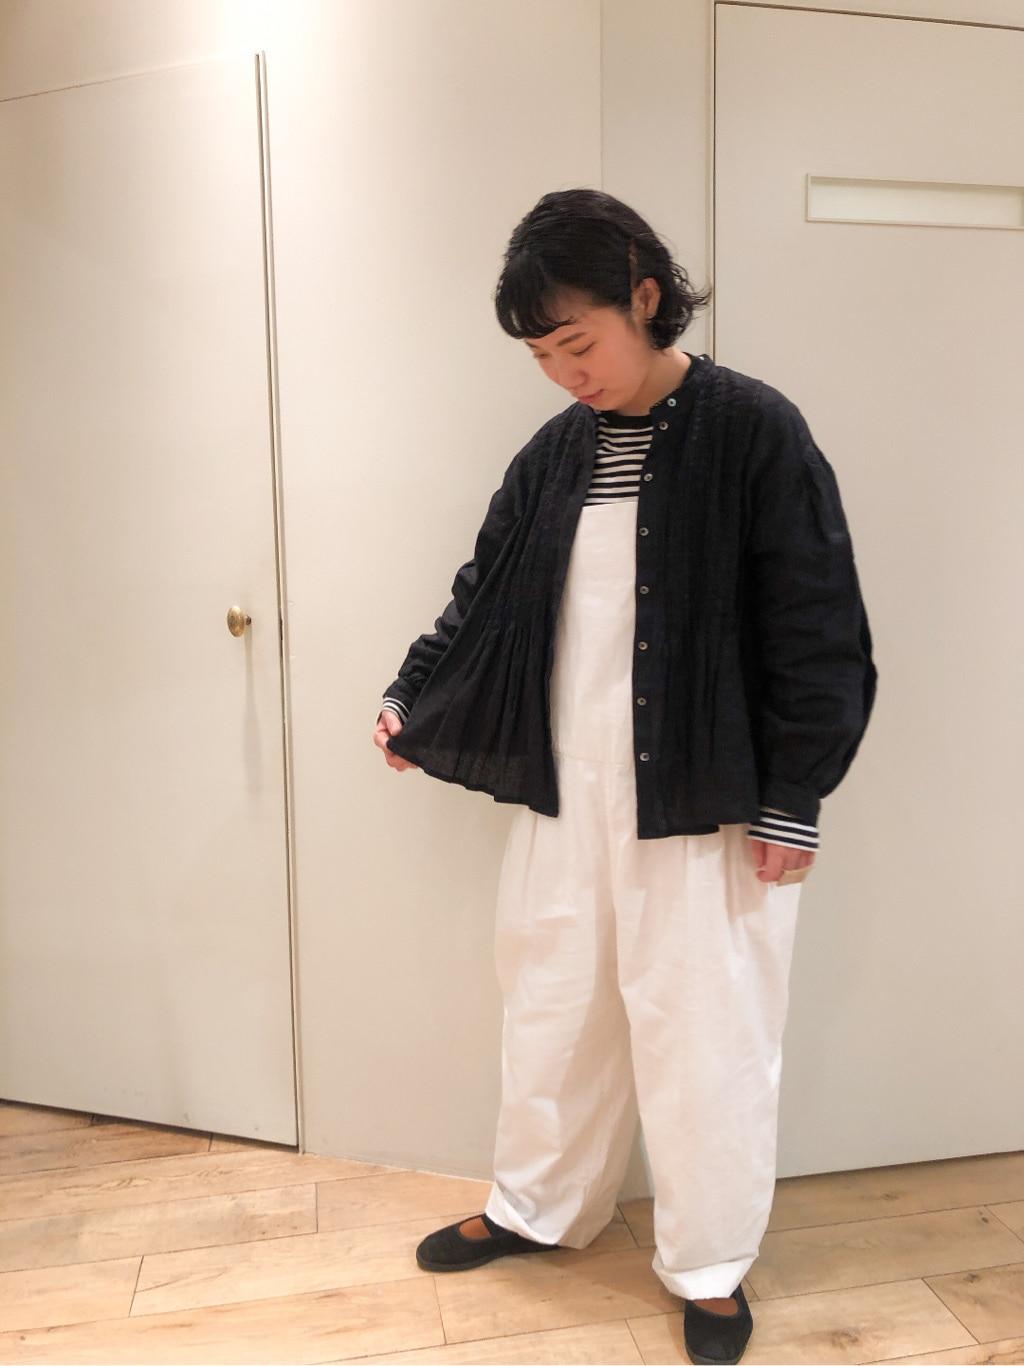 bulle de savon 新宿ミロード 身長:156cm 2021.02.22